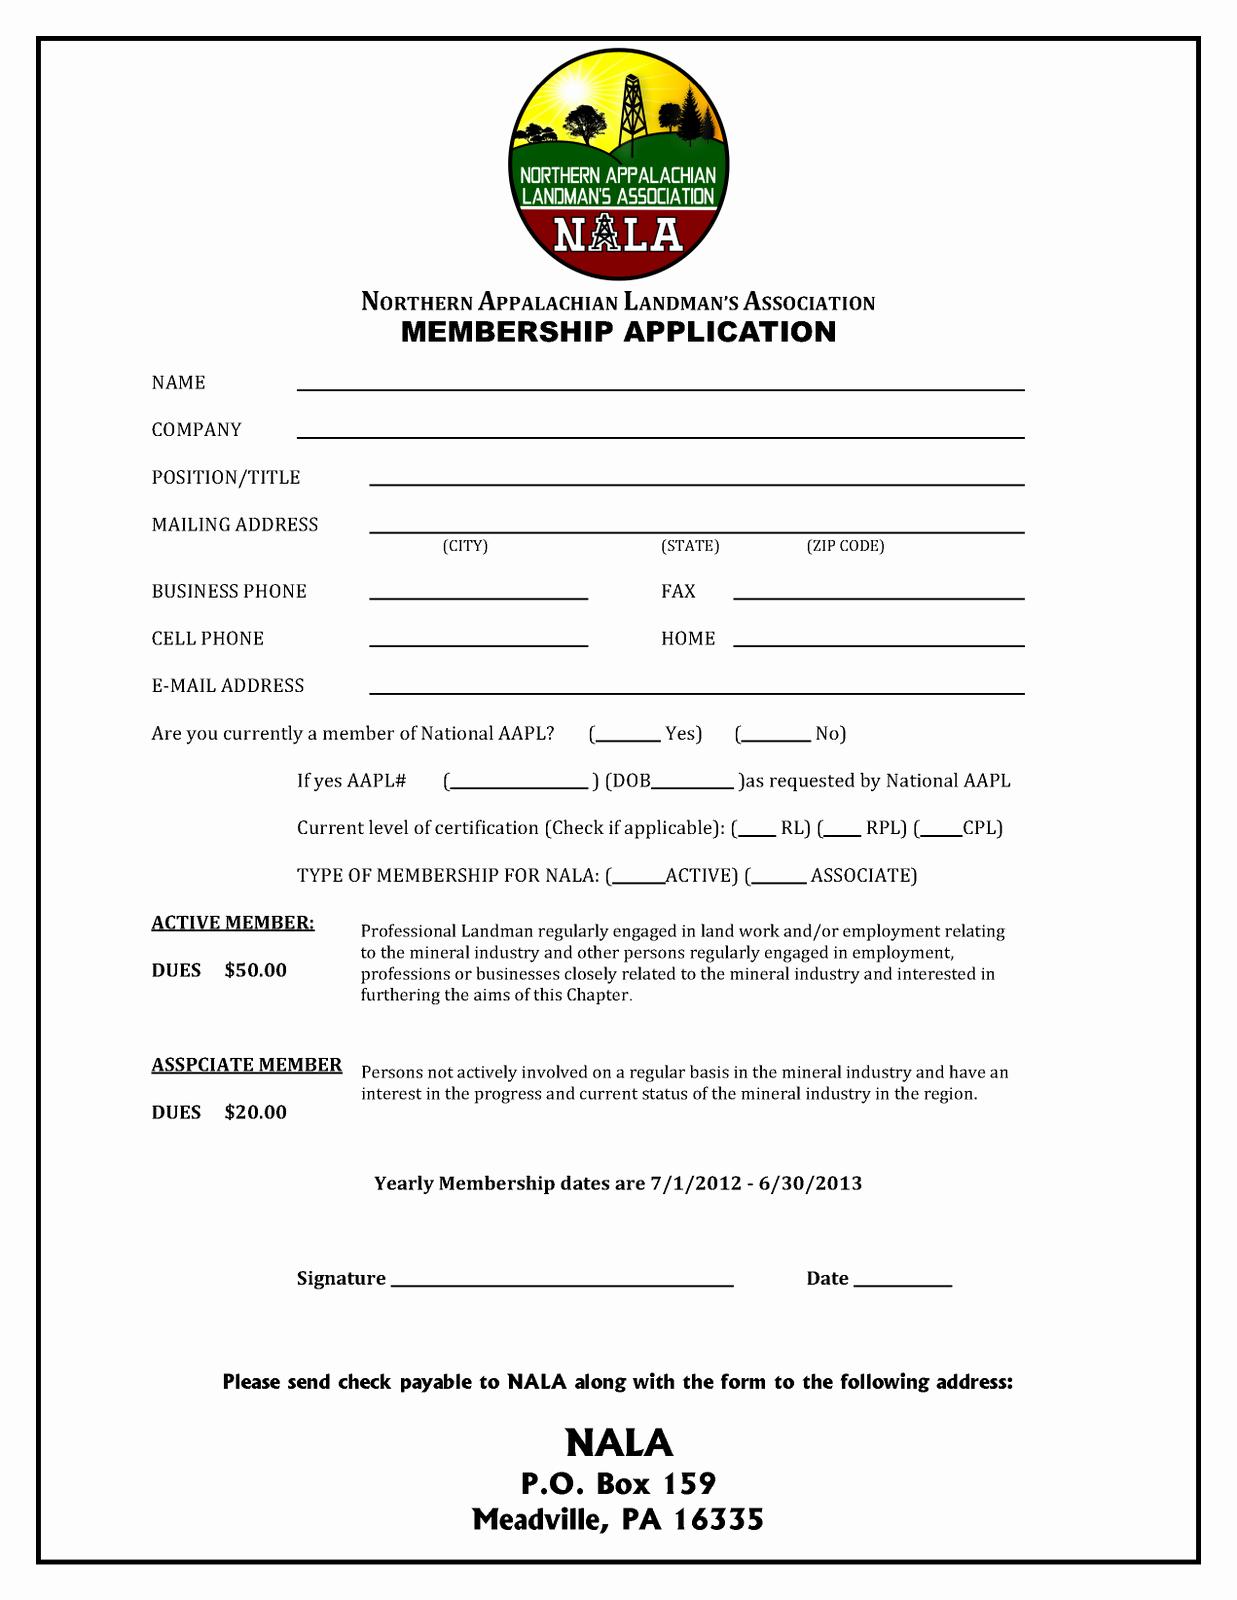 Membership Application Template Free Unique northern Appalachian Landman S association Membership